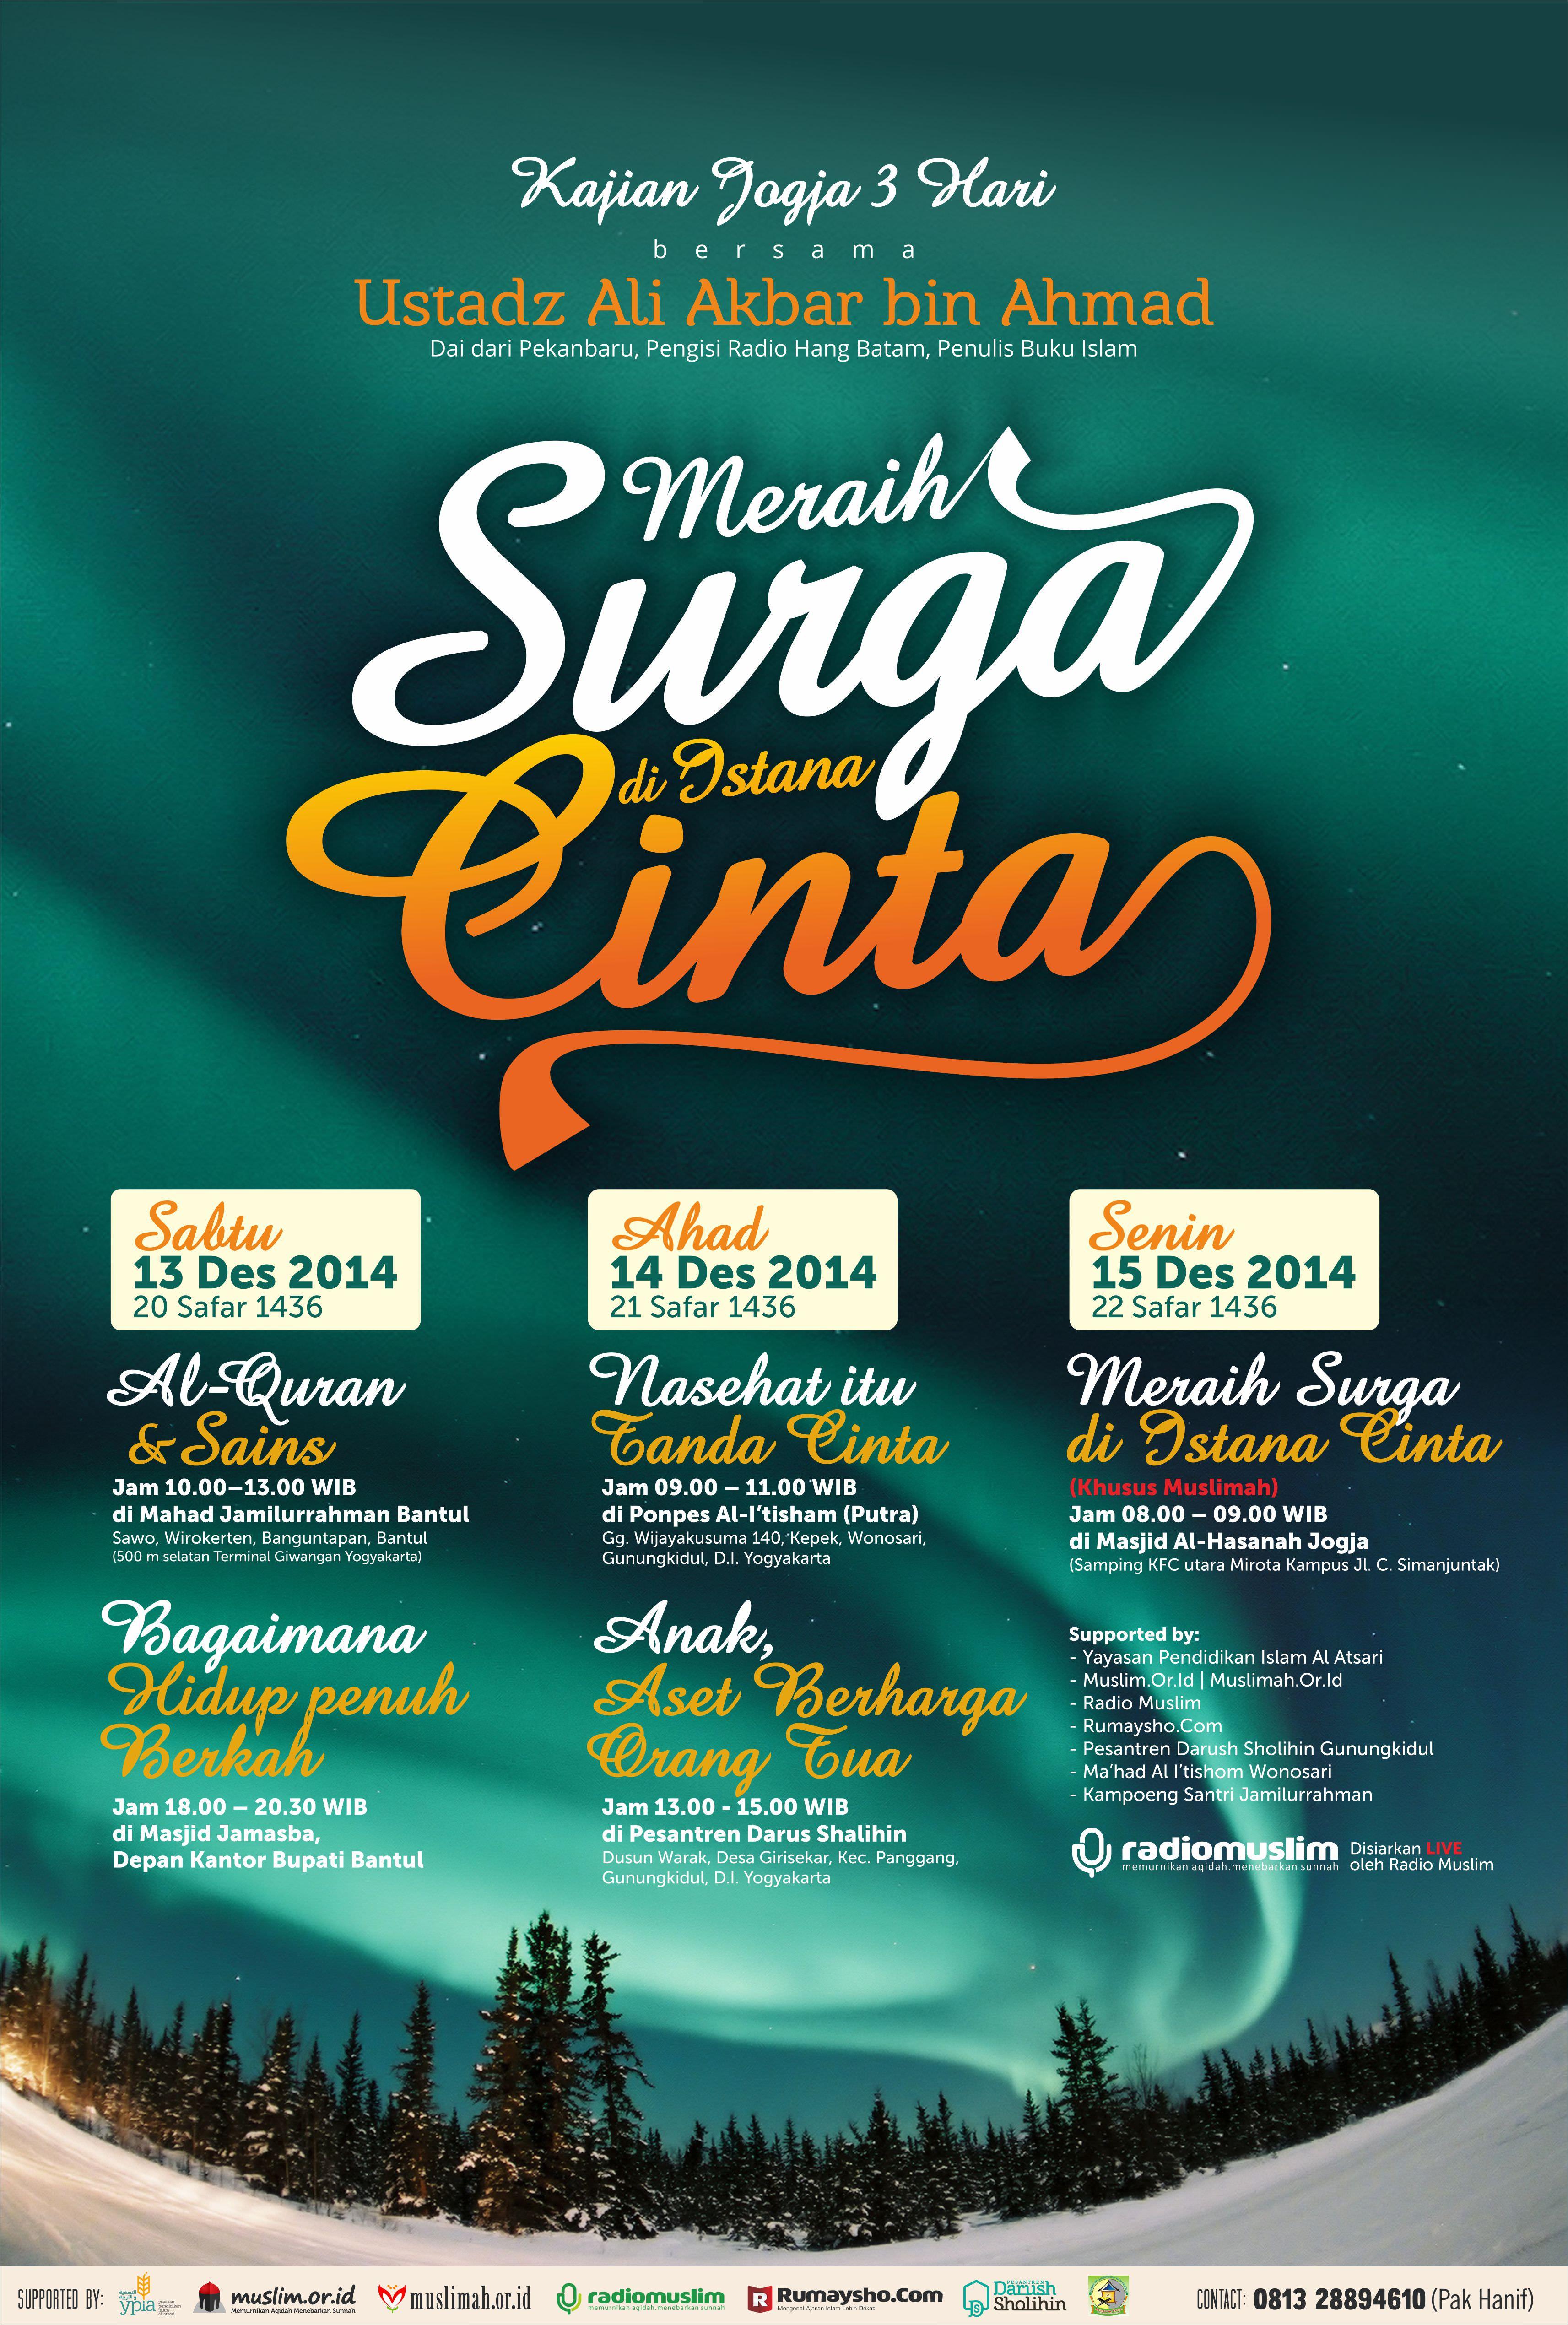 Info Kajian Islam Ahlussunnah Radio Muslim Yogyakarta